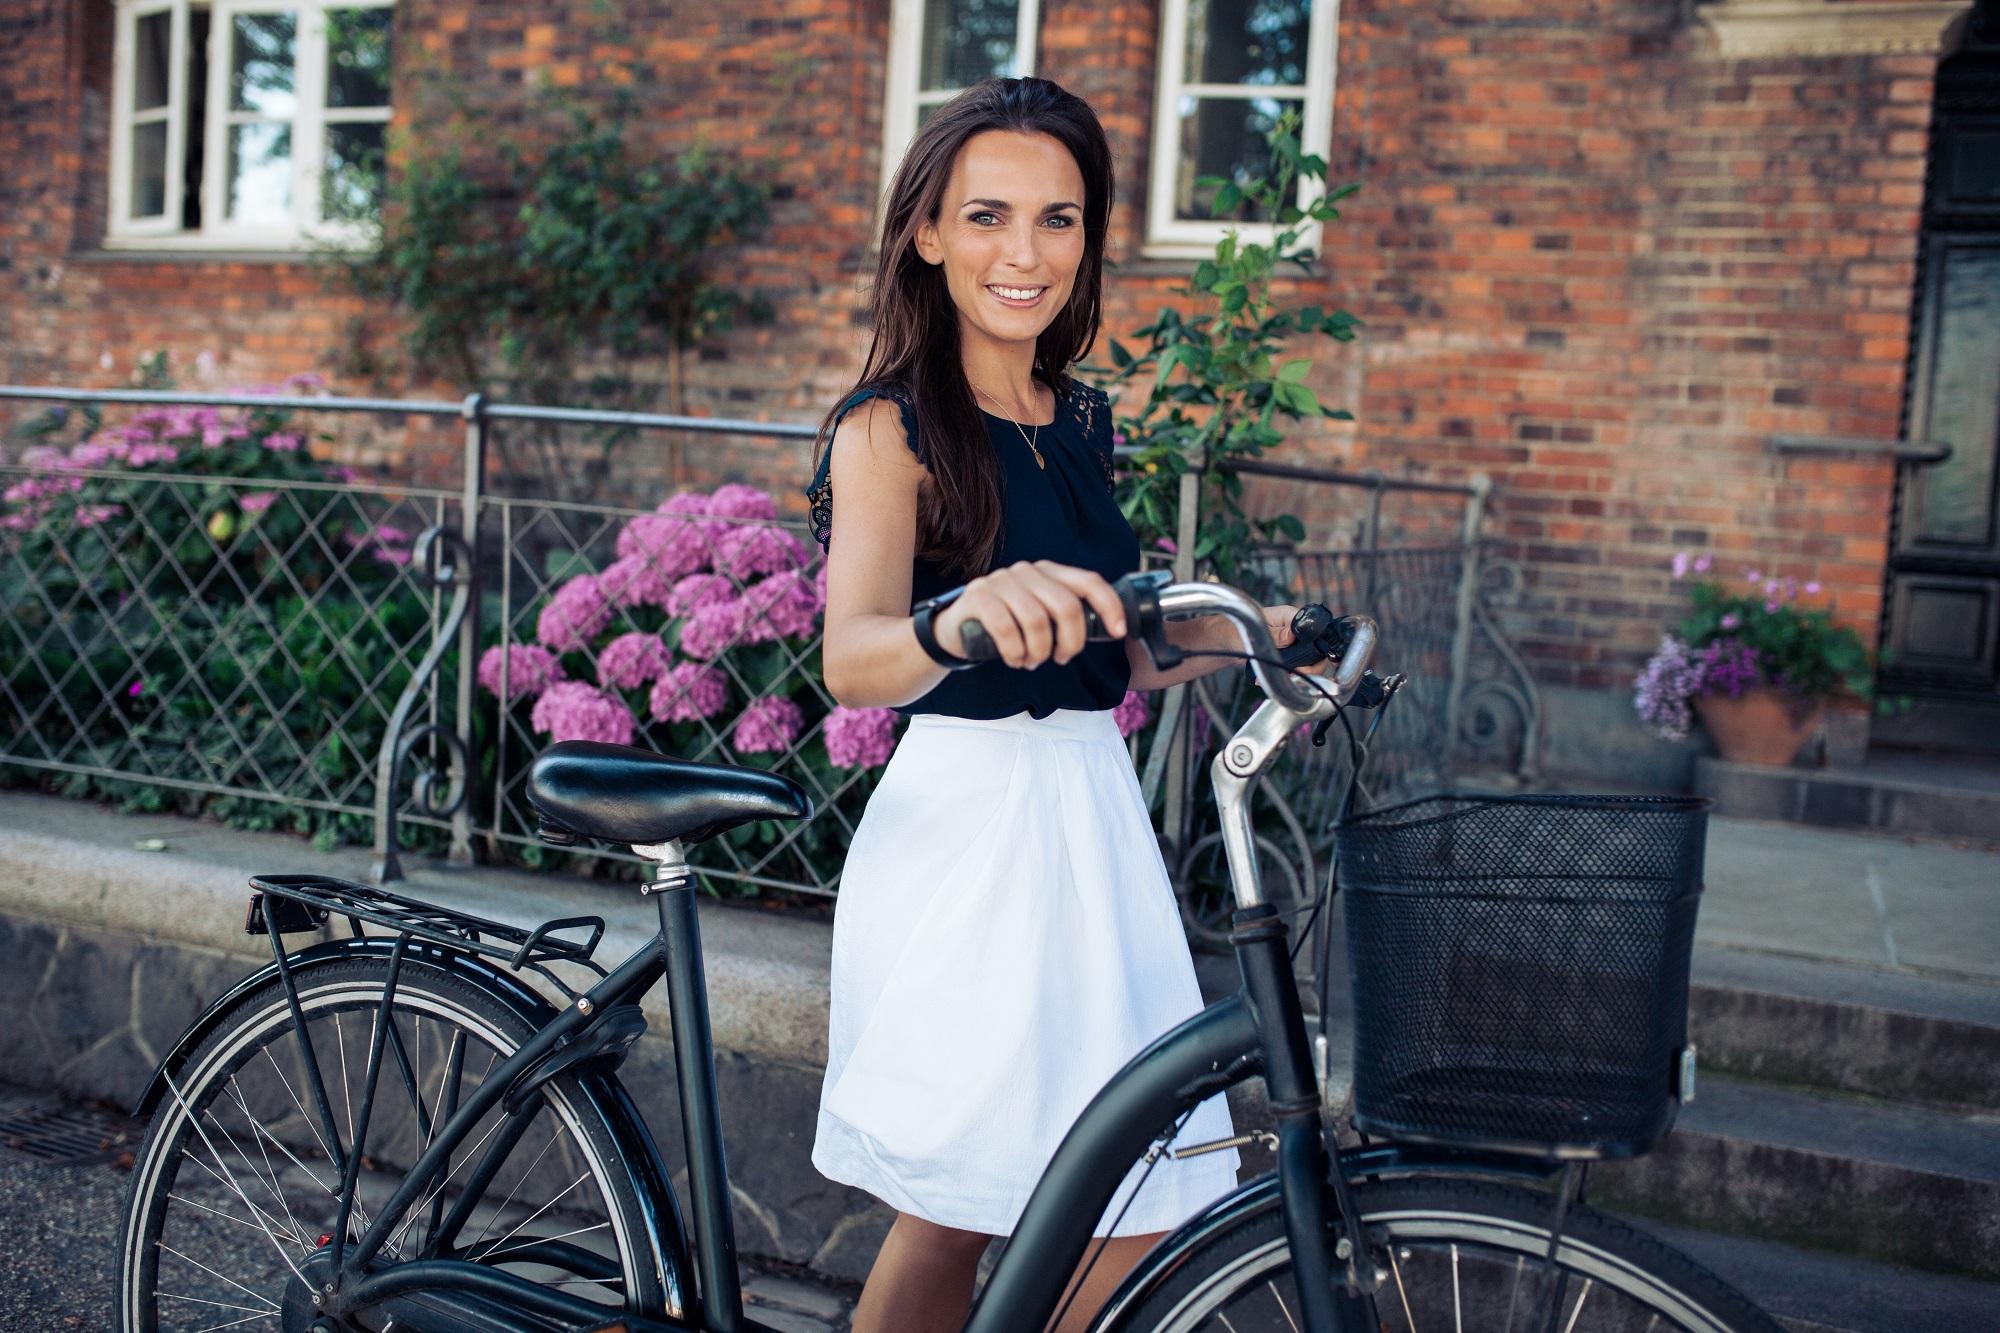 gt-bike-woman